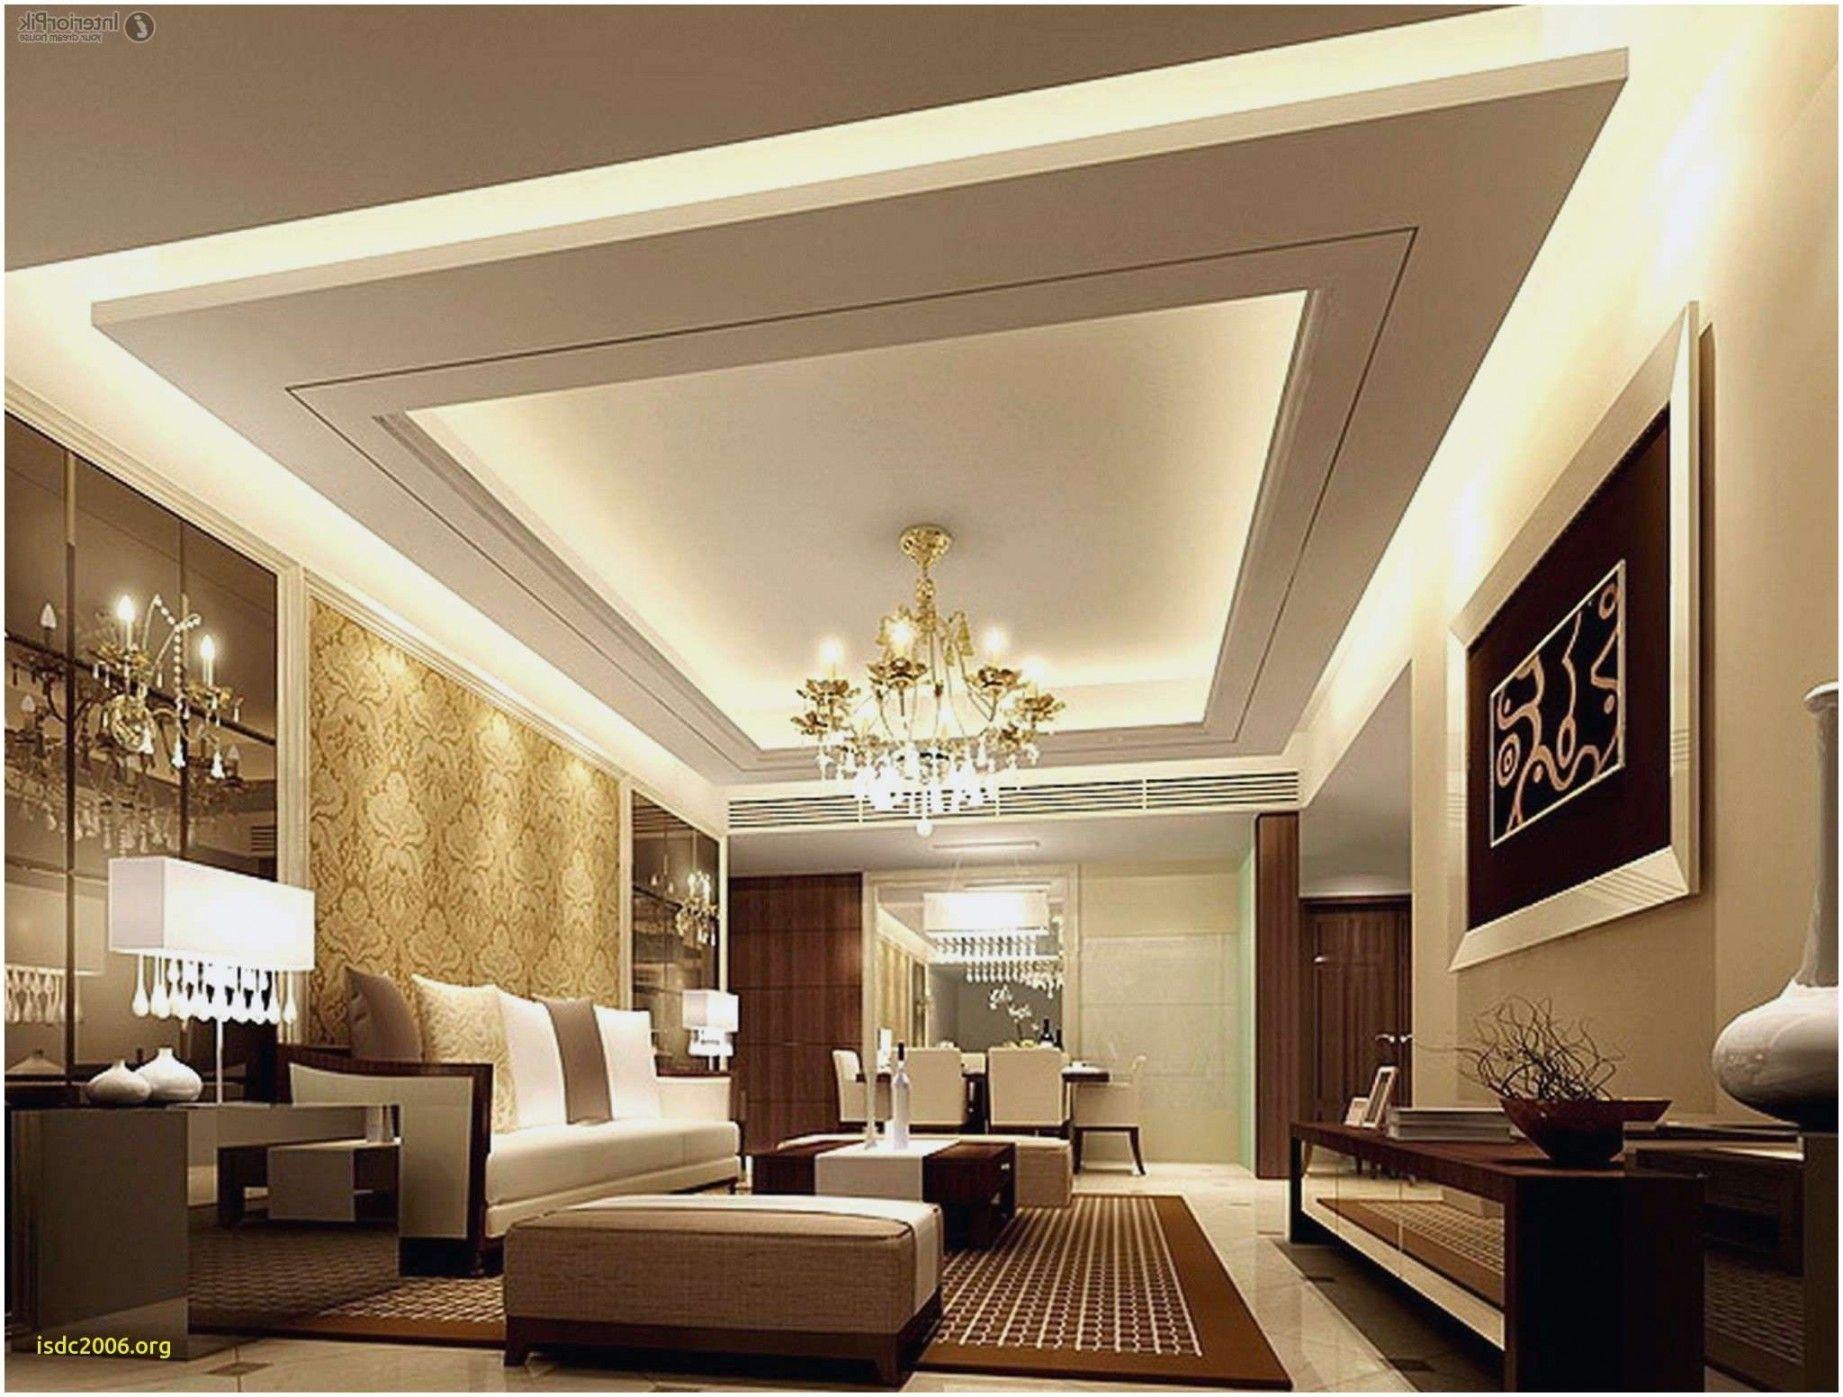 Best Of Living Room Design Nepal Ceiling Design Living Room Pop False Ceiling Design Ceiling Design Bedroom